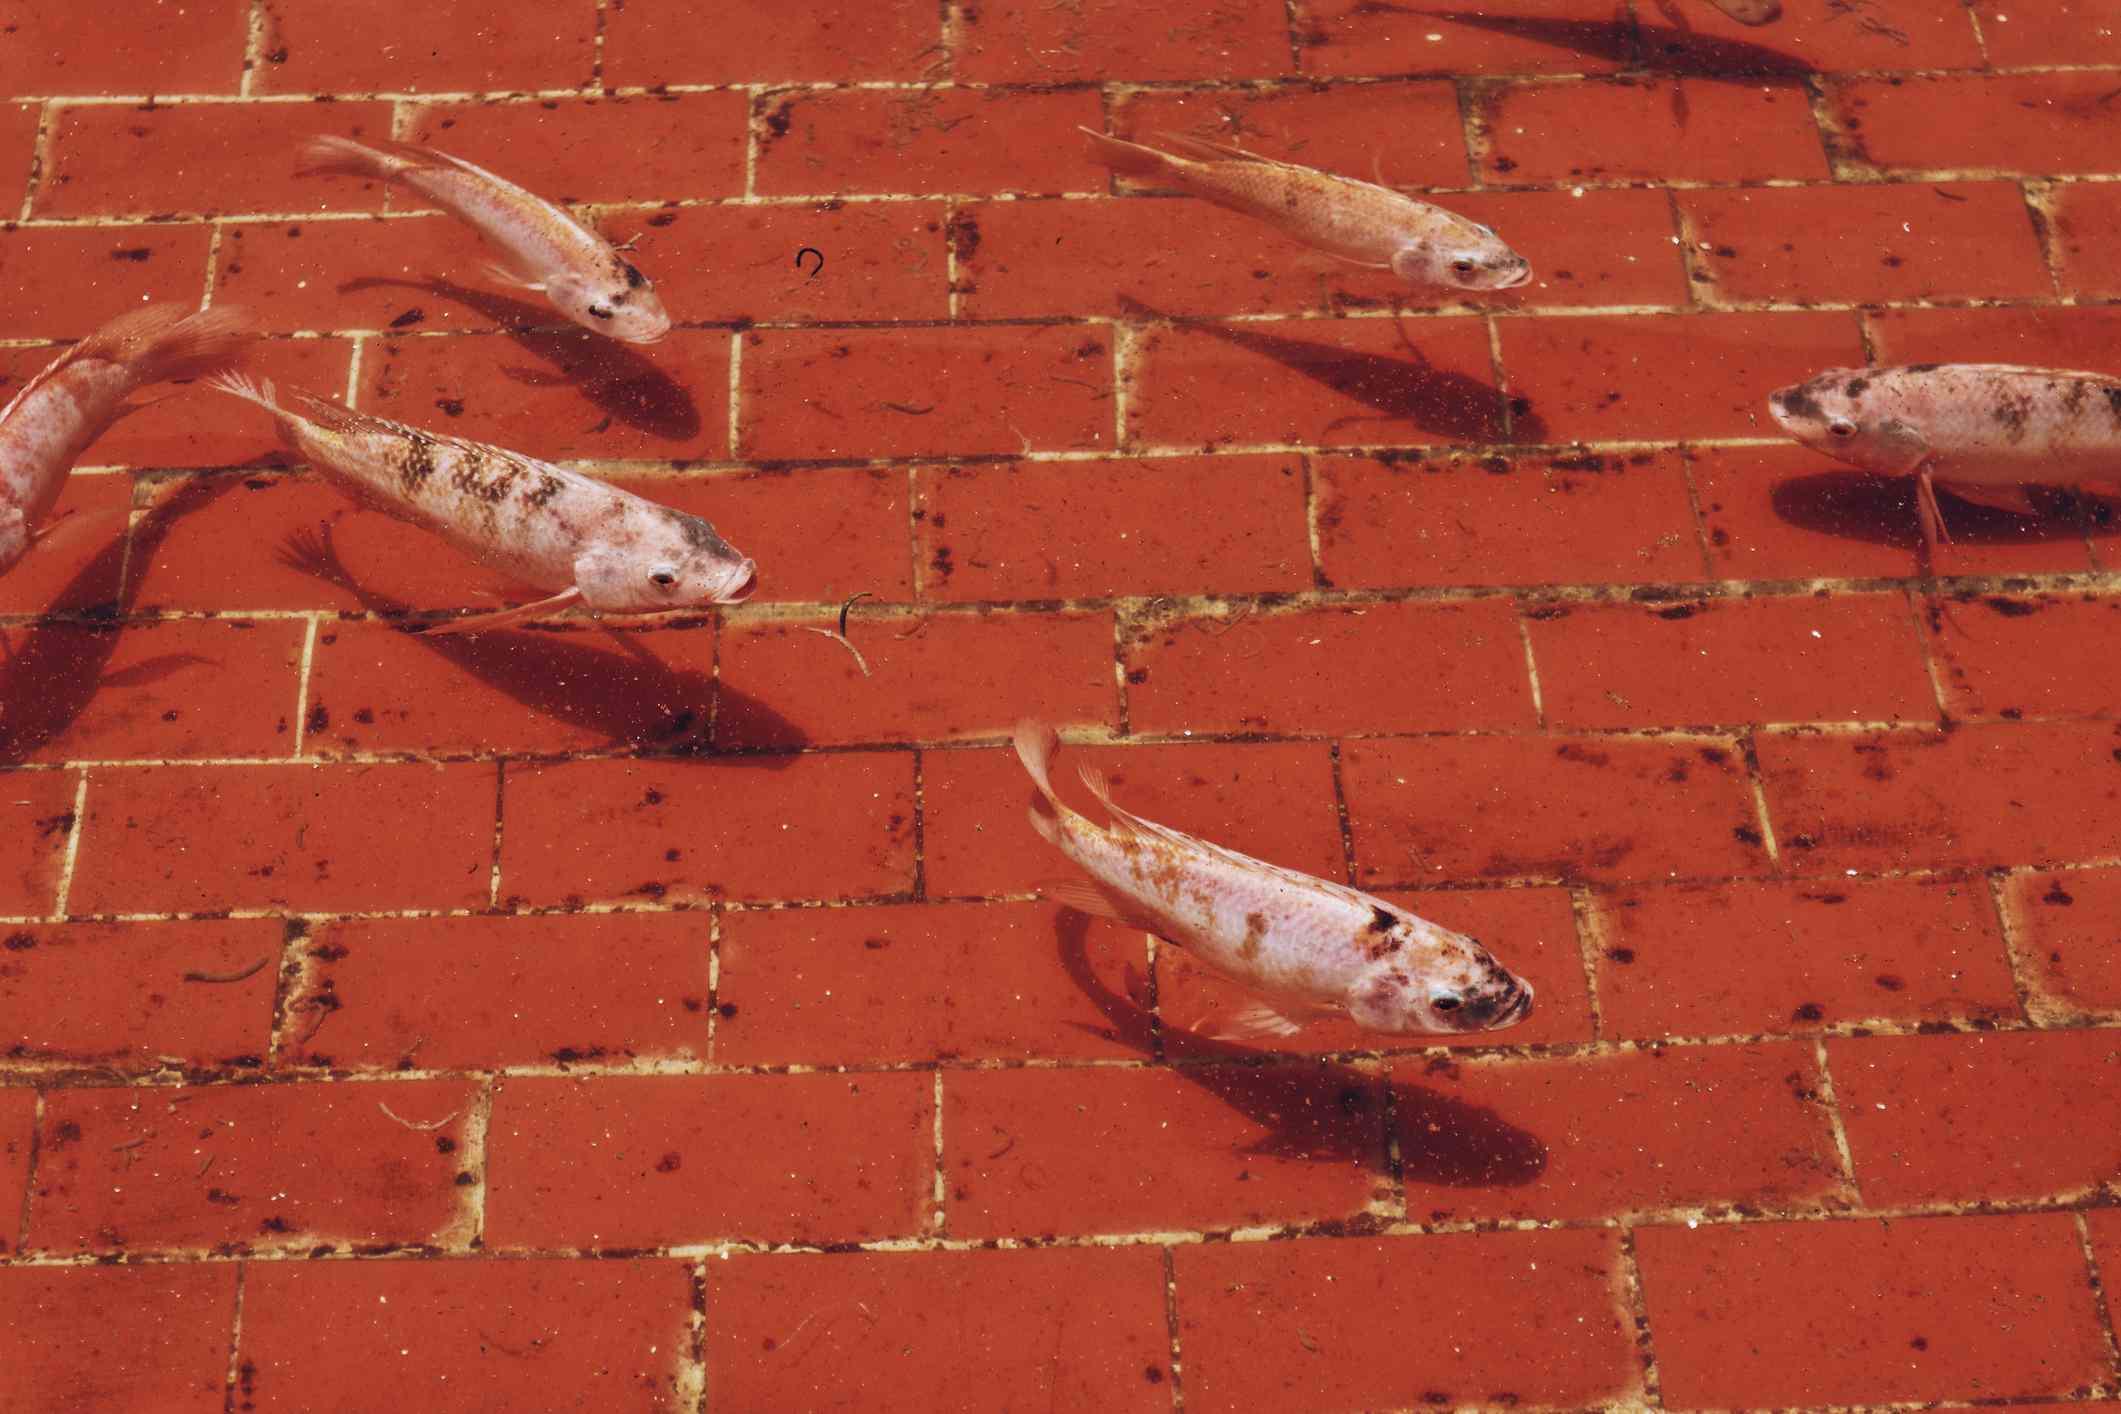 White koi fish swimming in a red brick pond.